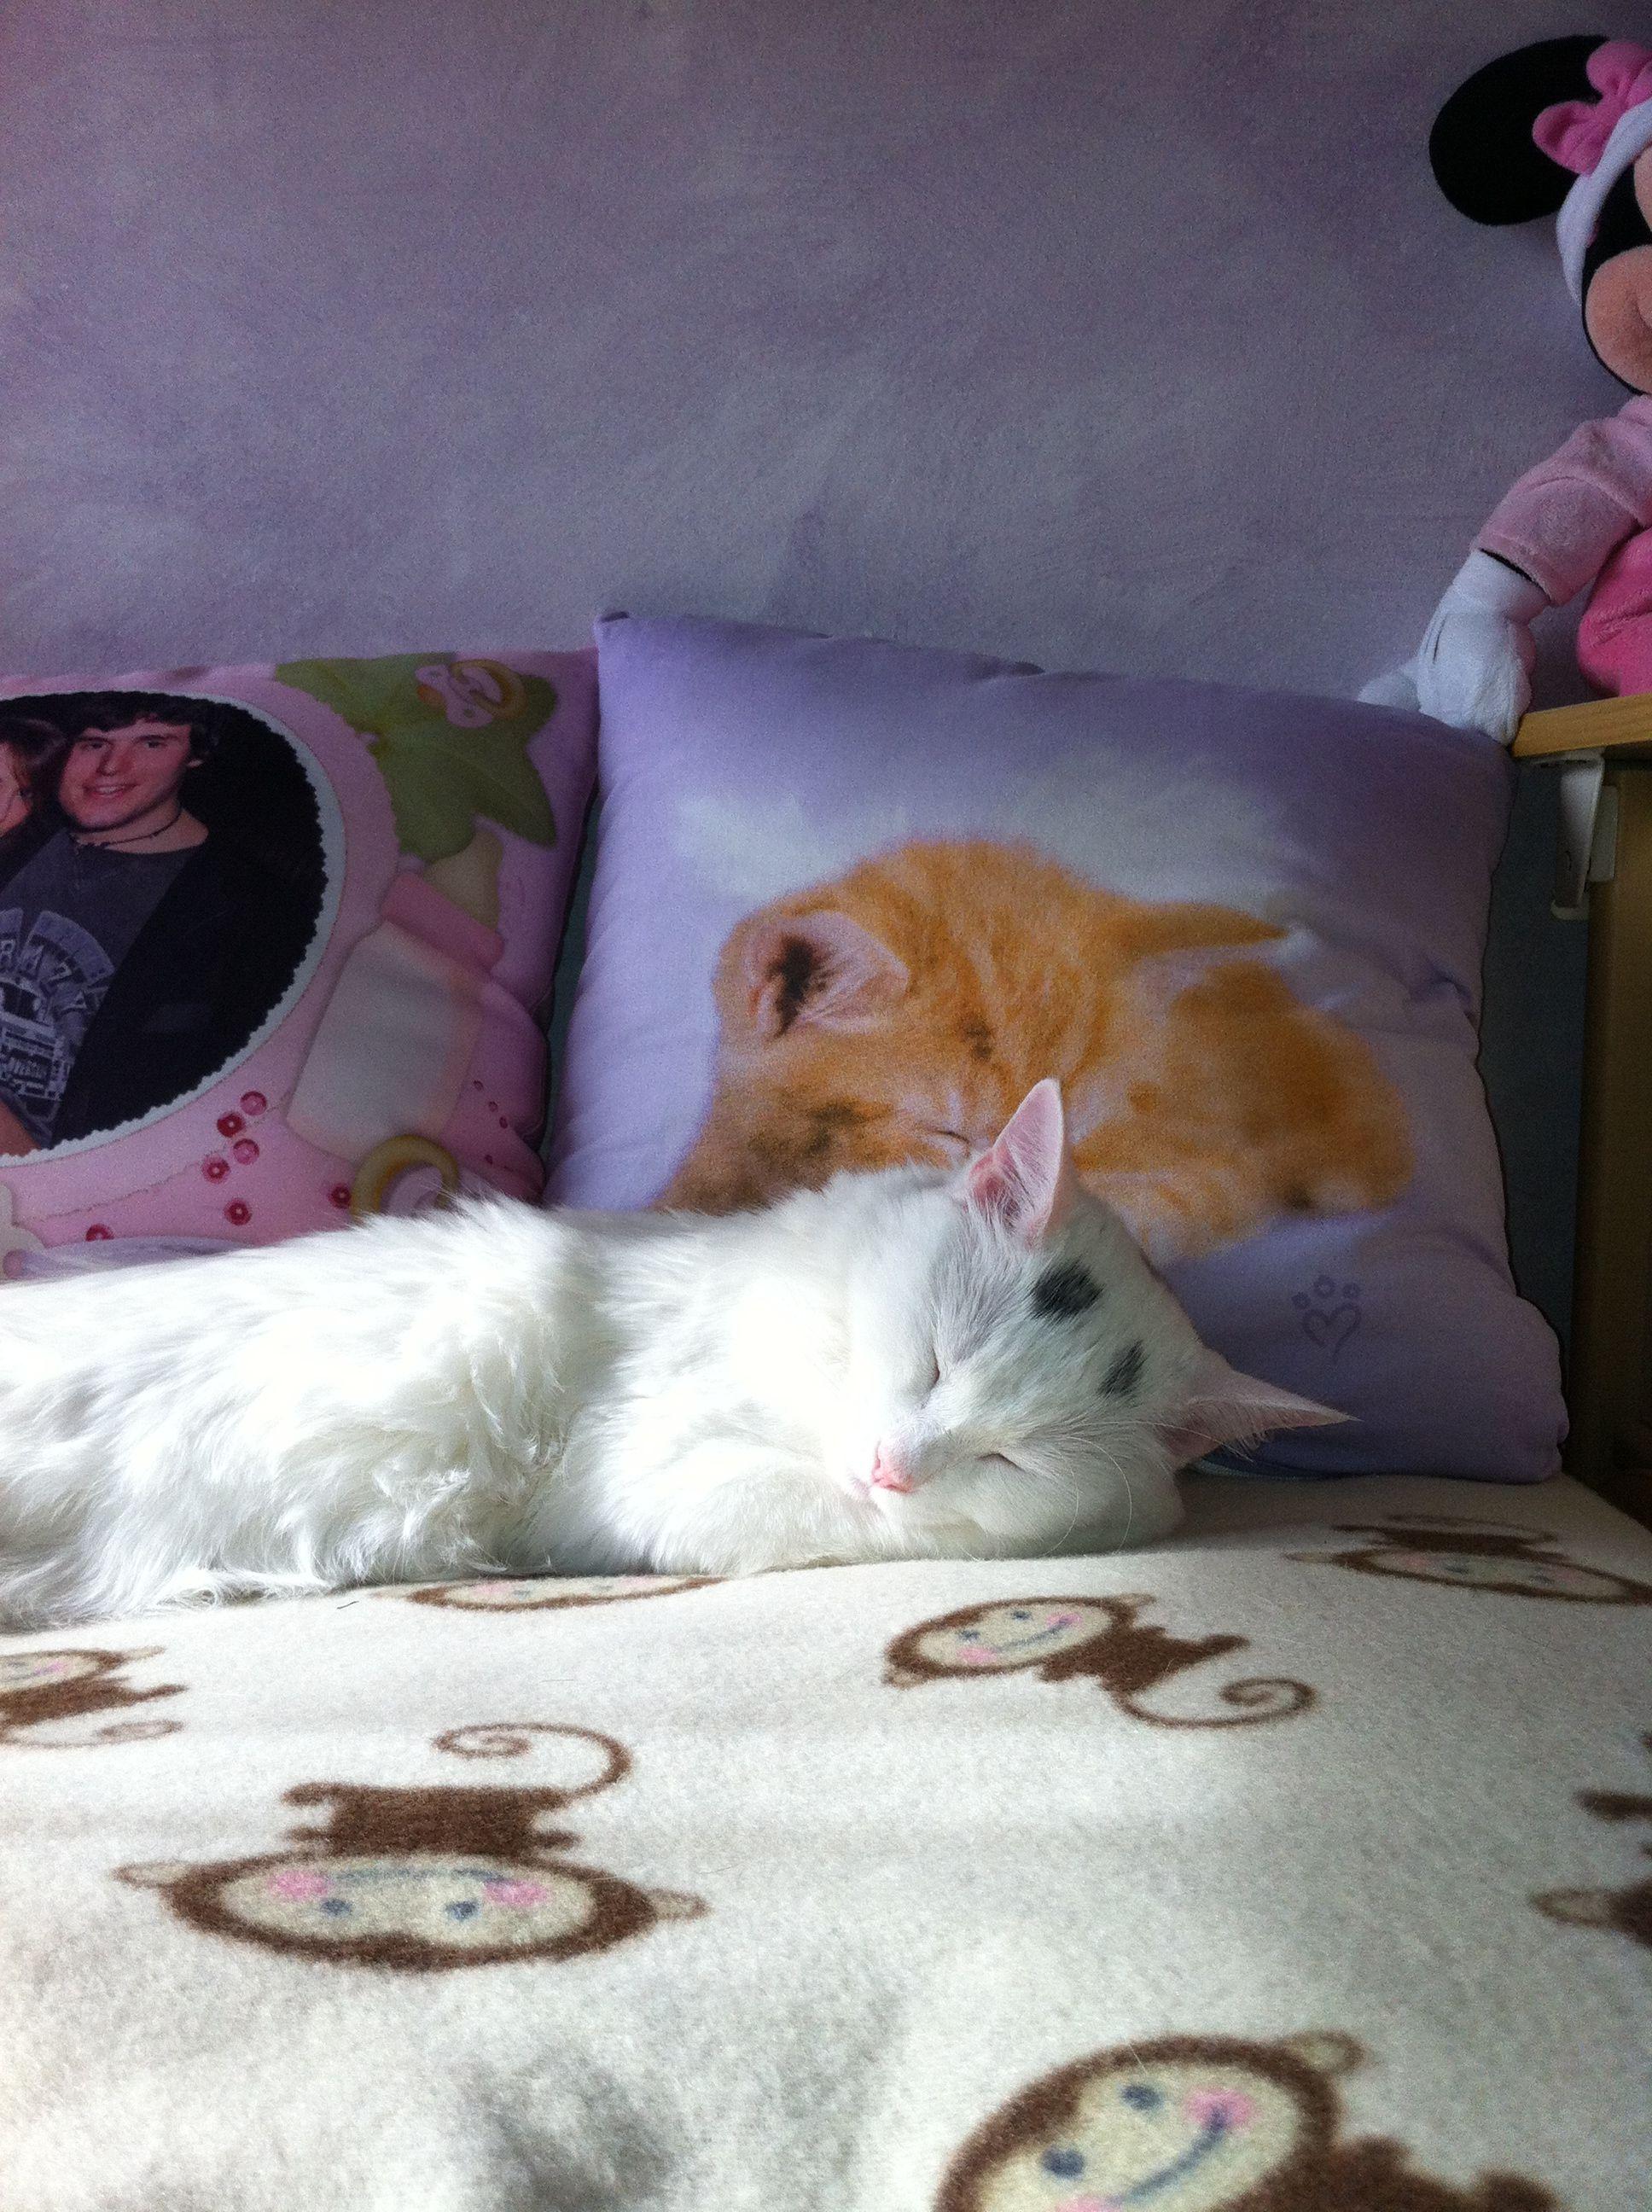 Sleeping.....#cat #sweetdream #bed